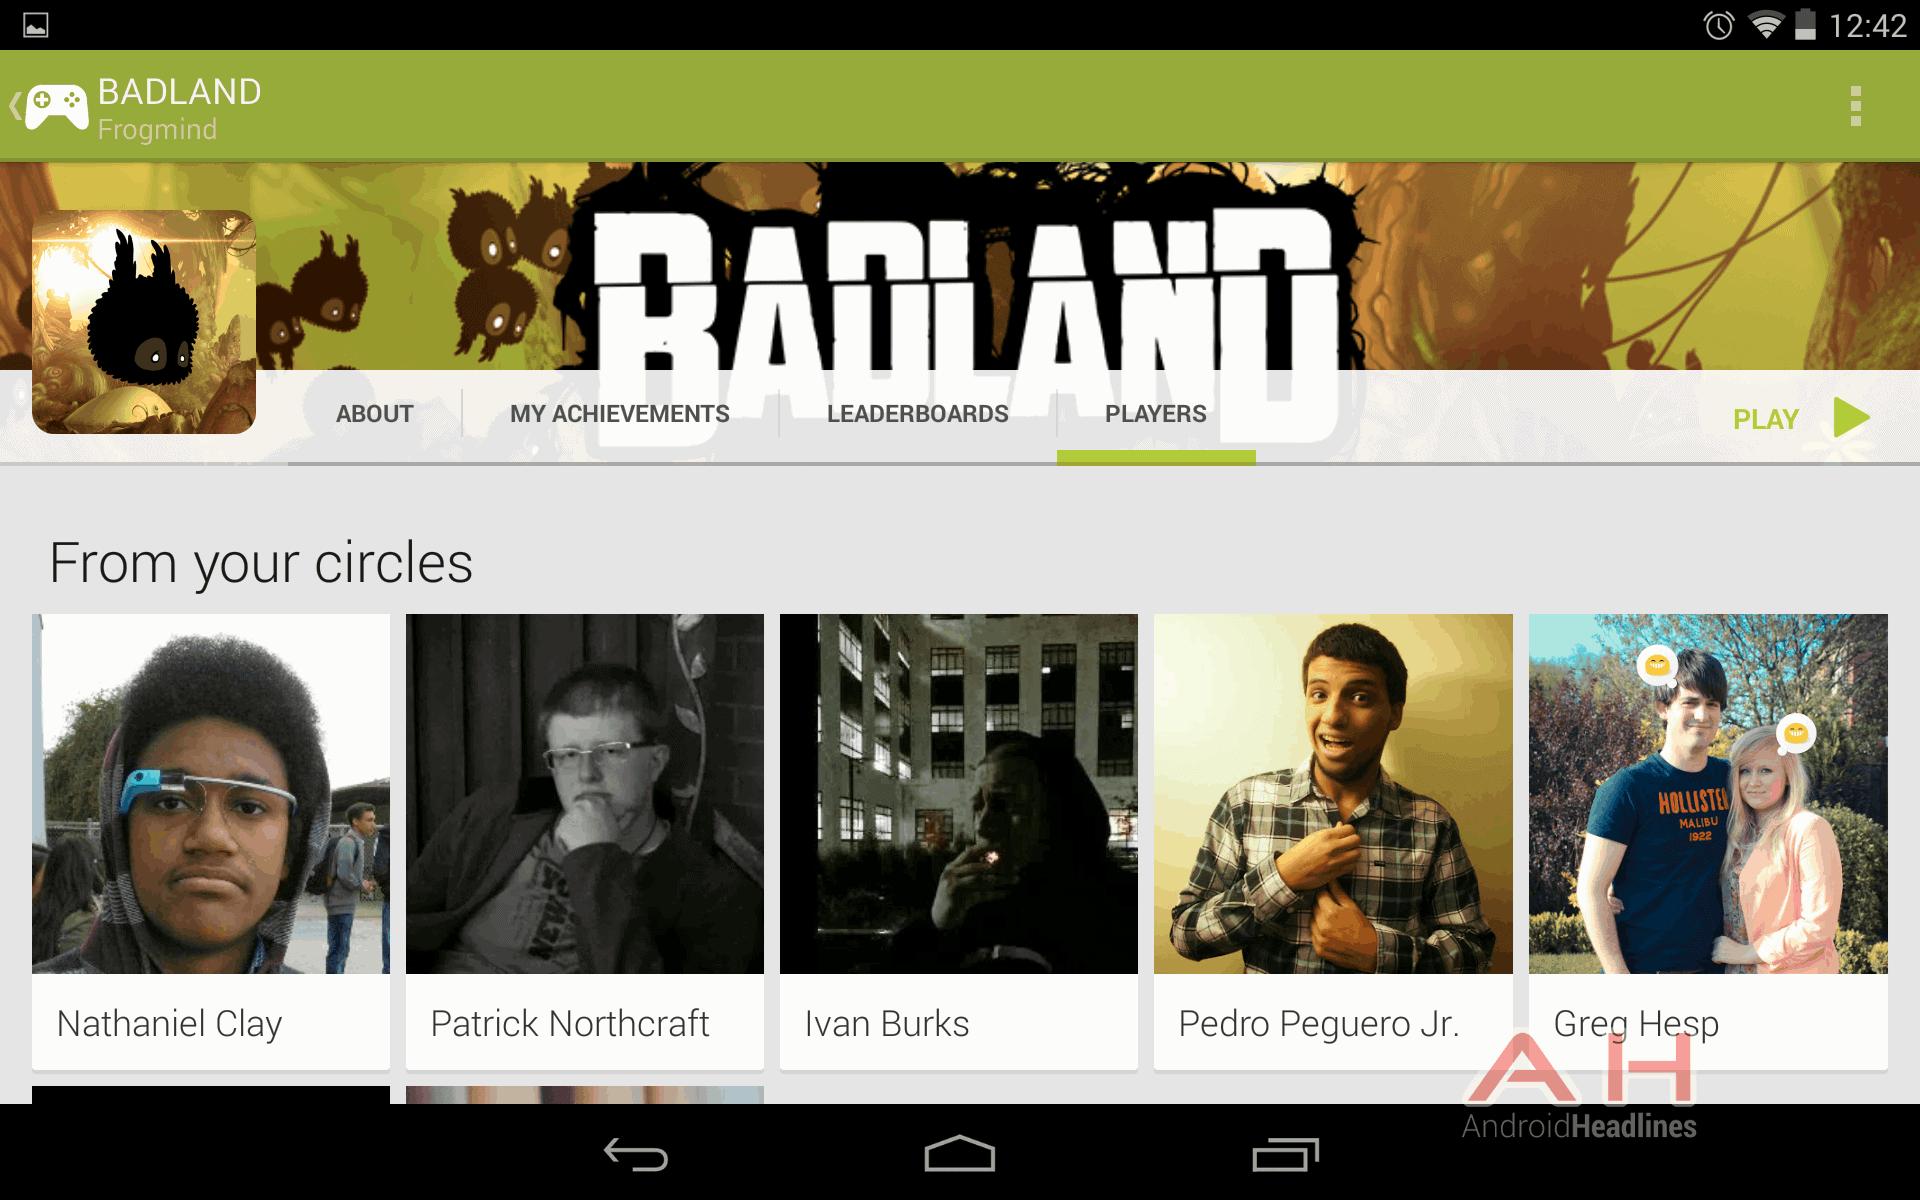 Screenshot 2014 03 05 12 42 11